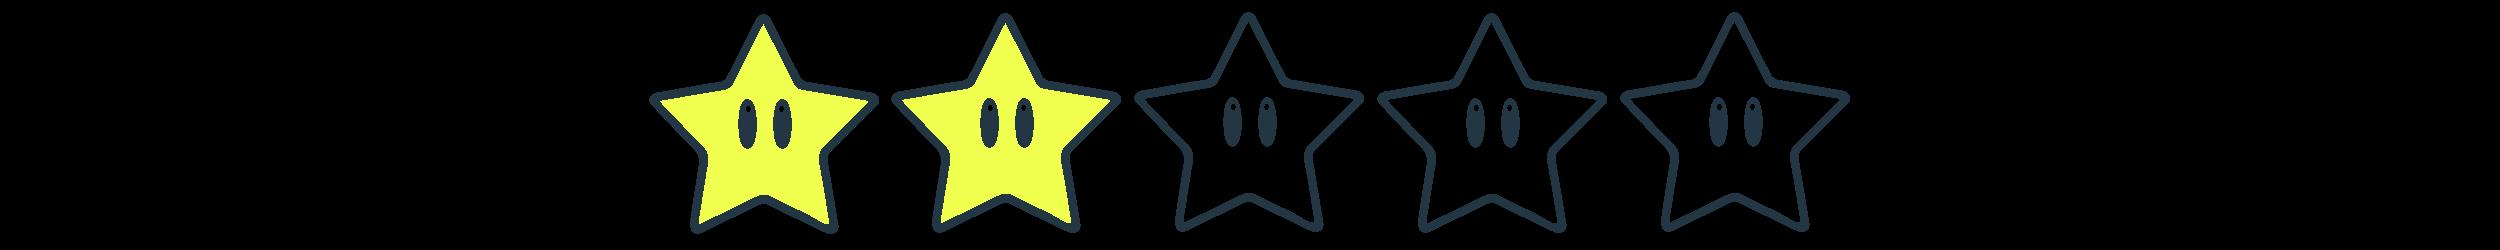 2 Stars.png